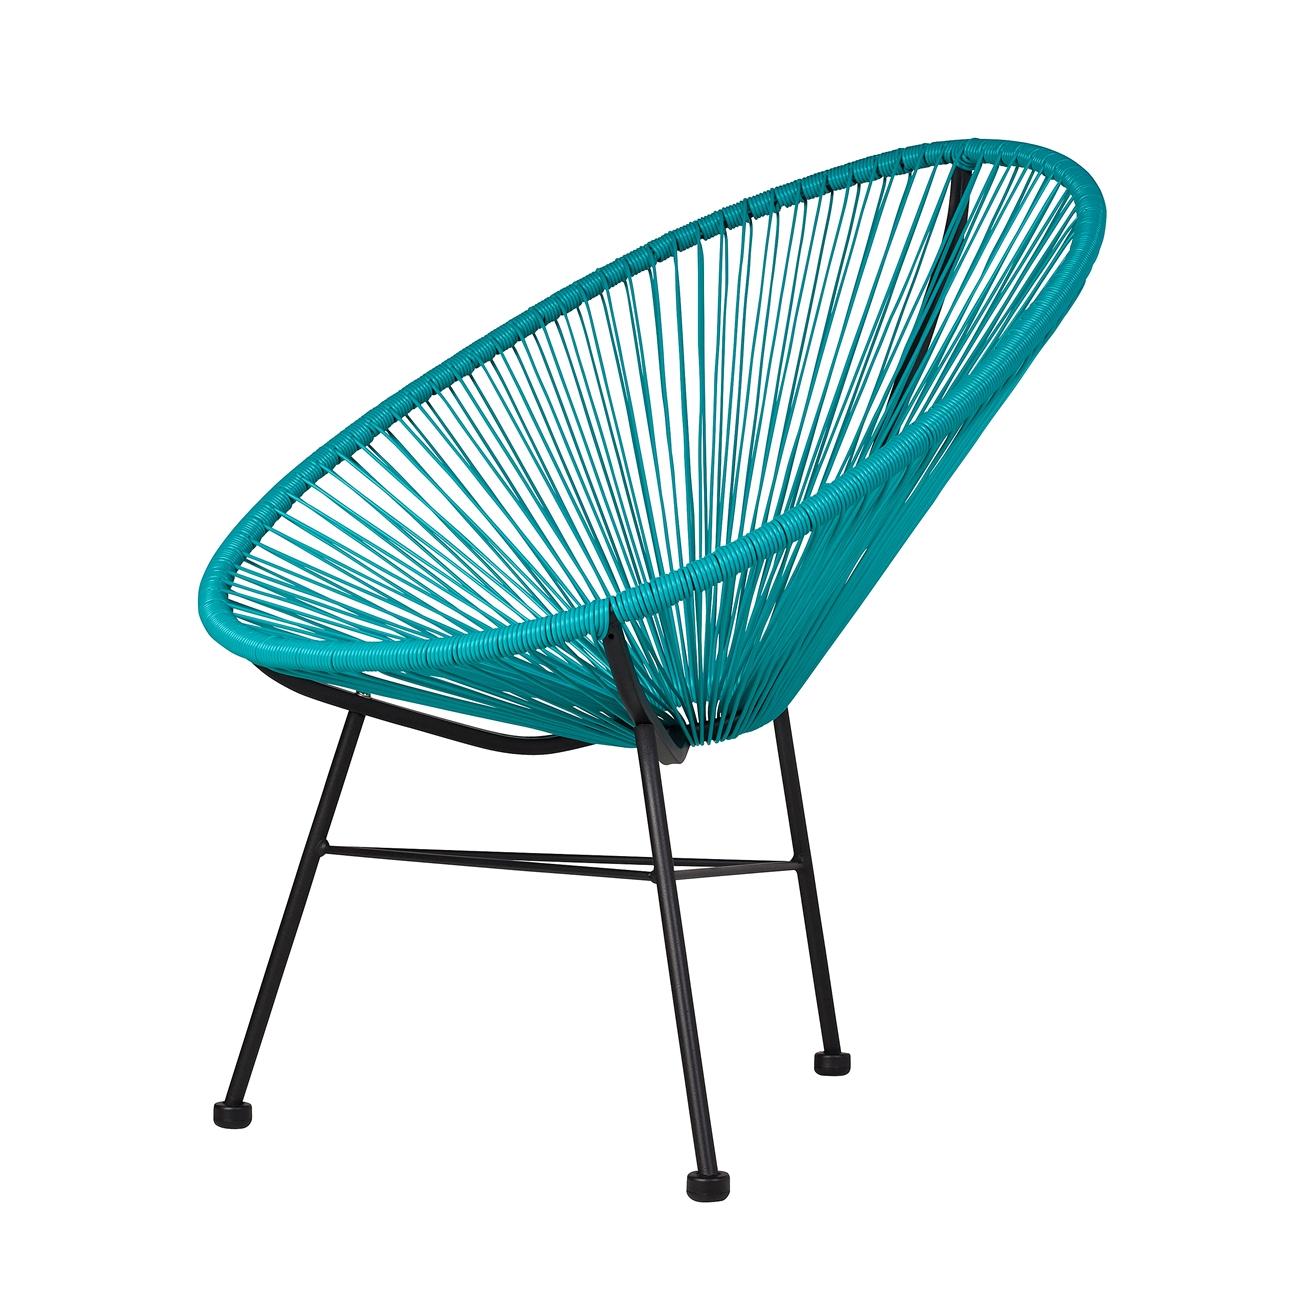 Outdoor lounge chair ... Outdoor lounge chair - blue · larger photo Email to a friend TBNHLMI